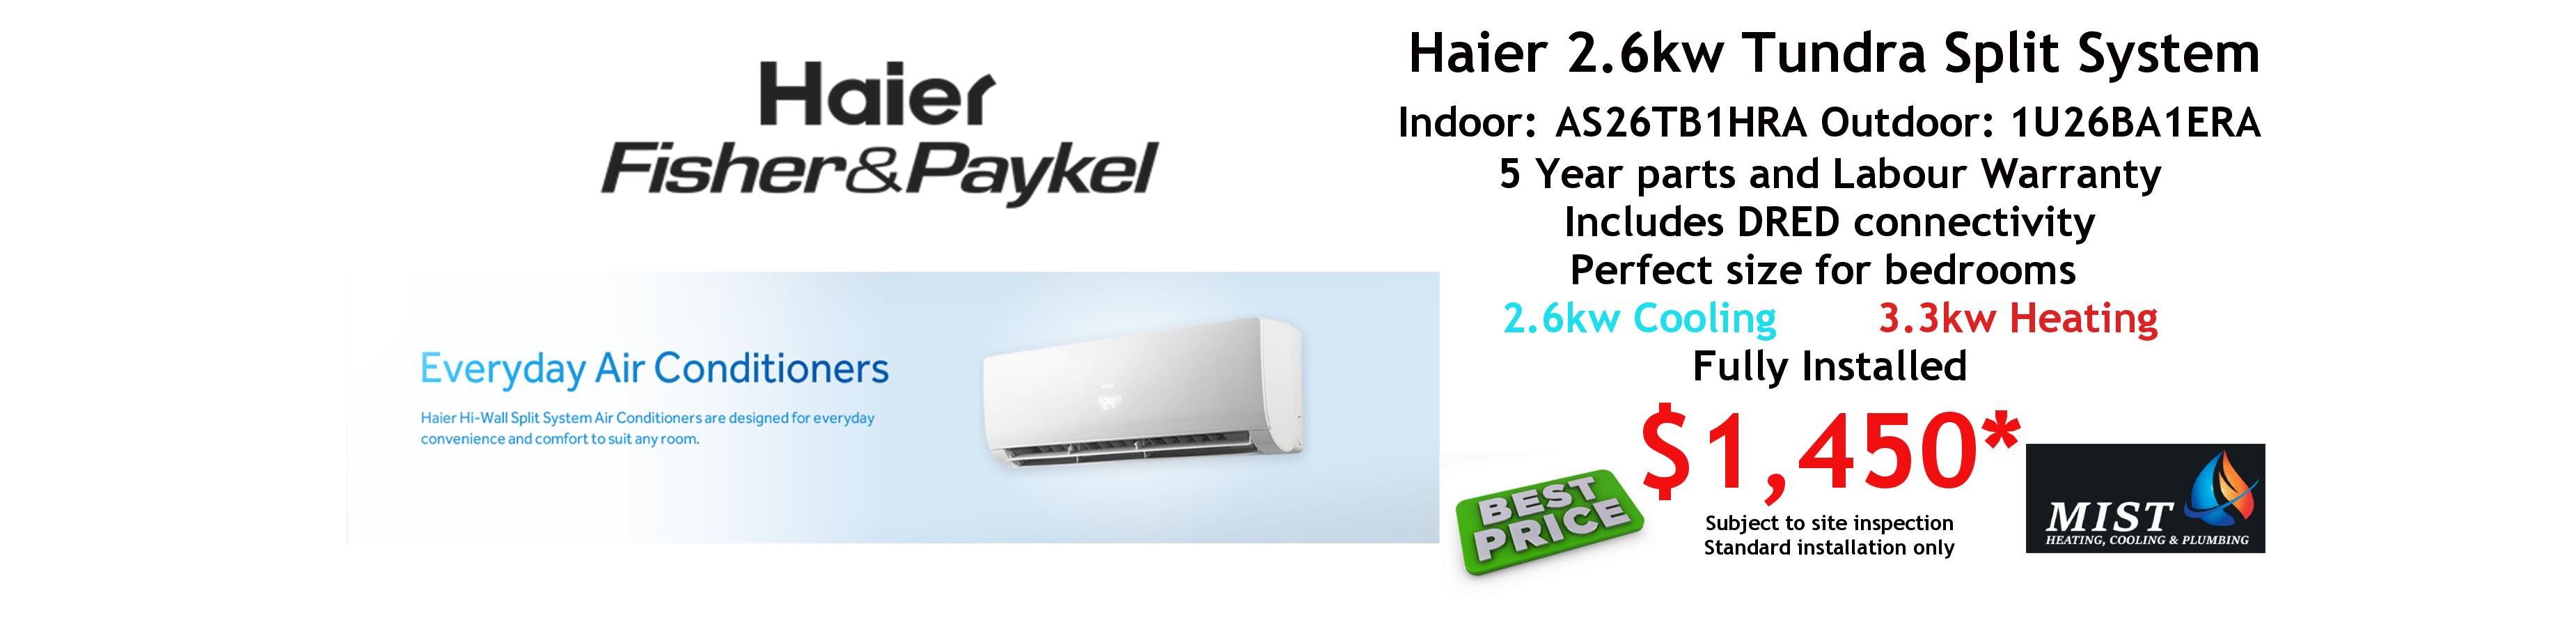 haier split 2.6kw